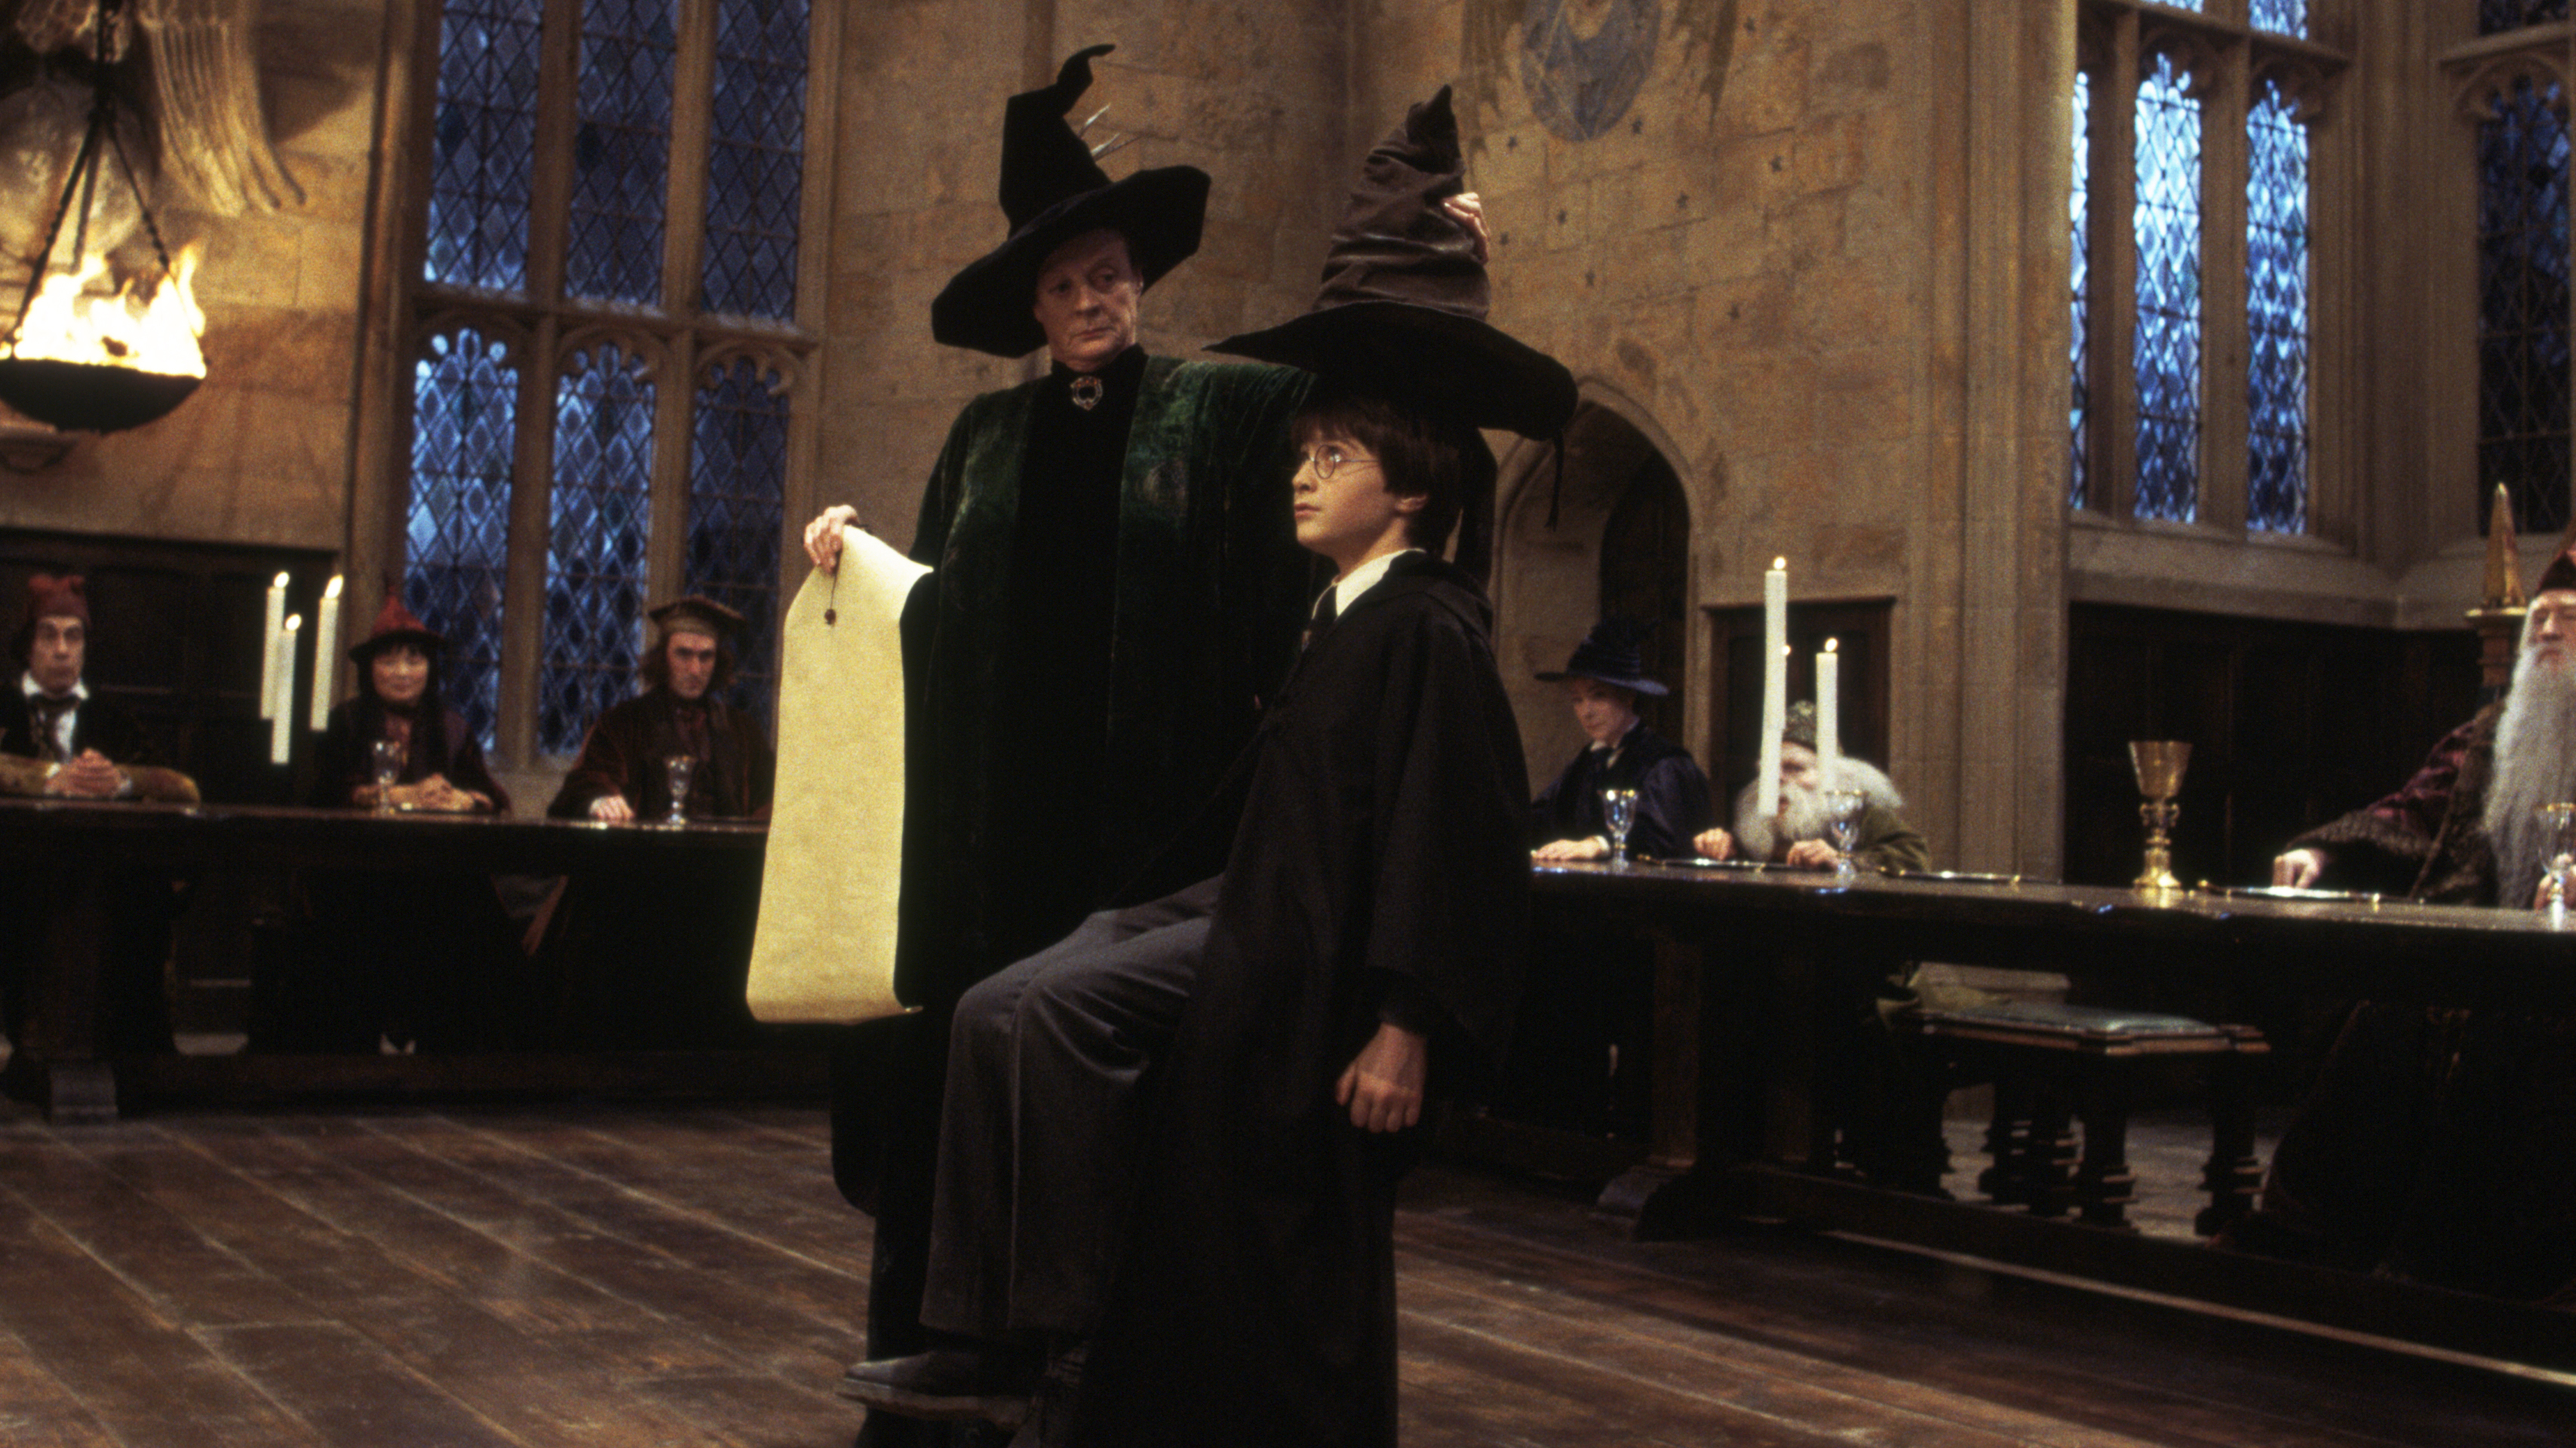 Harry Potter, HP, Wizarding World, HArry Potter y la piedra filosofal